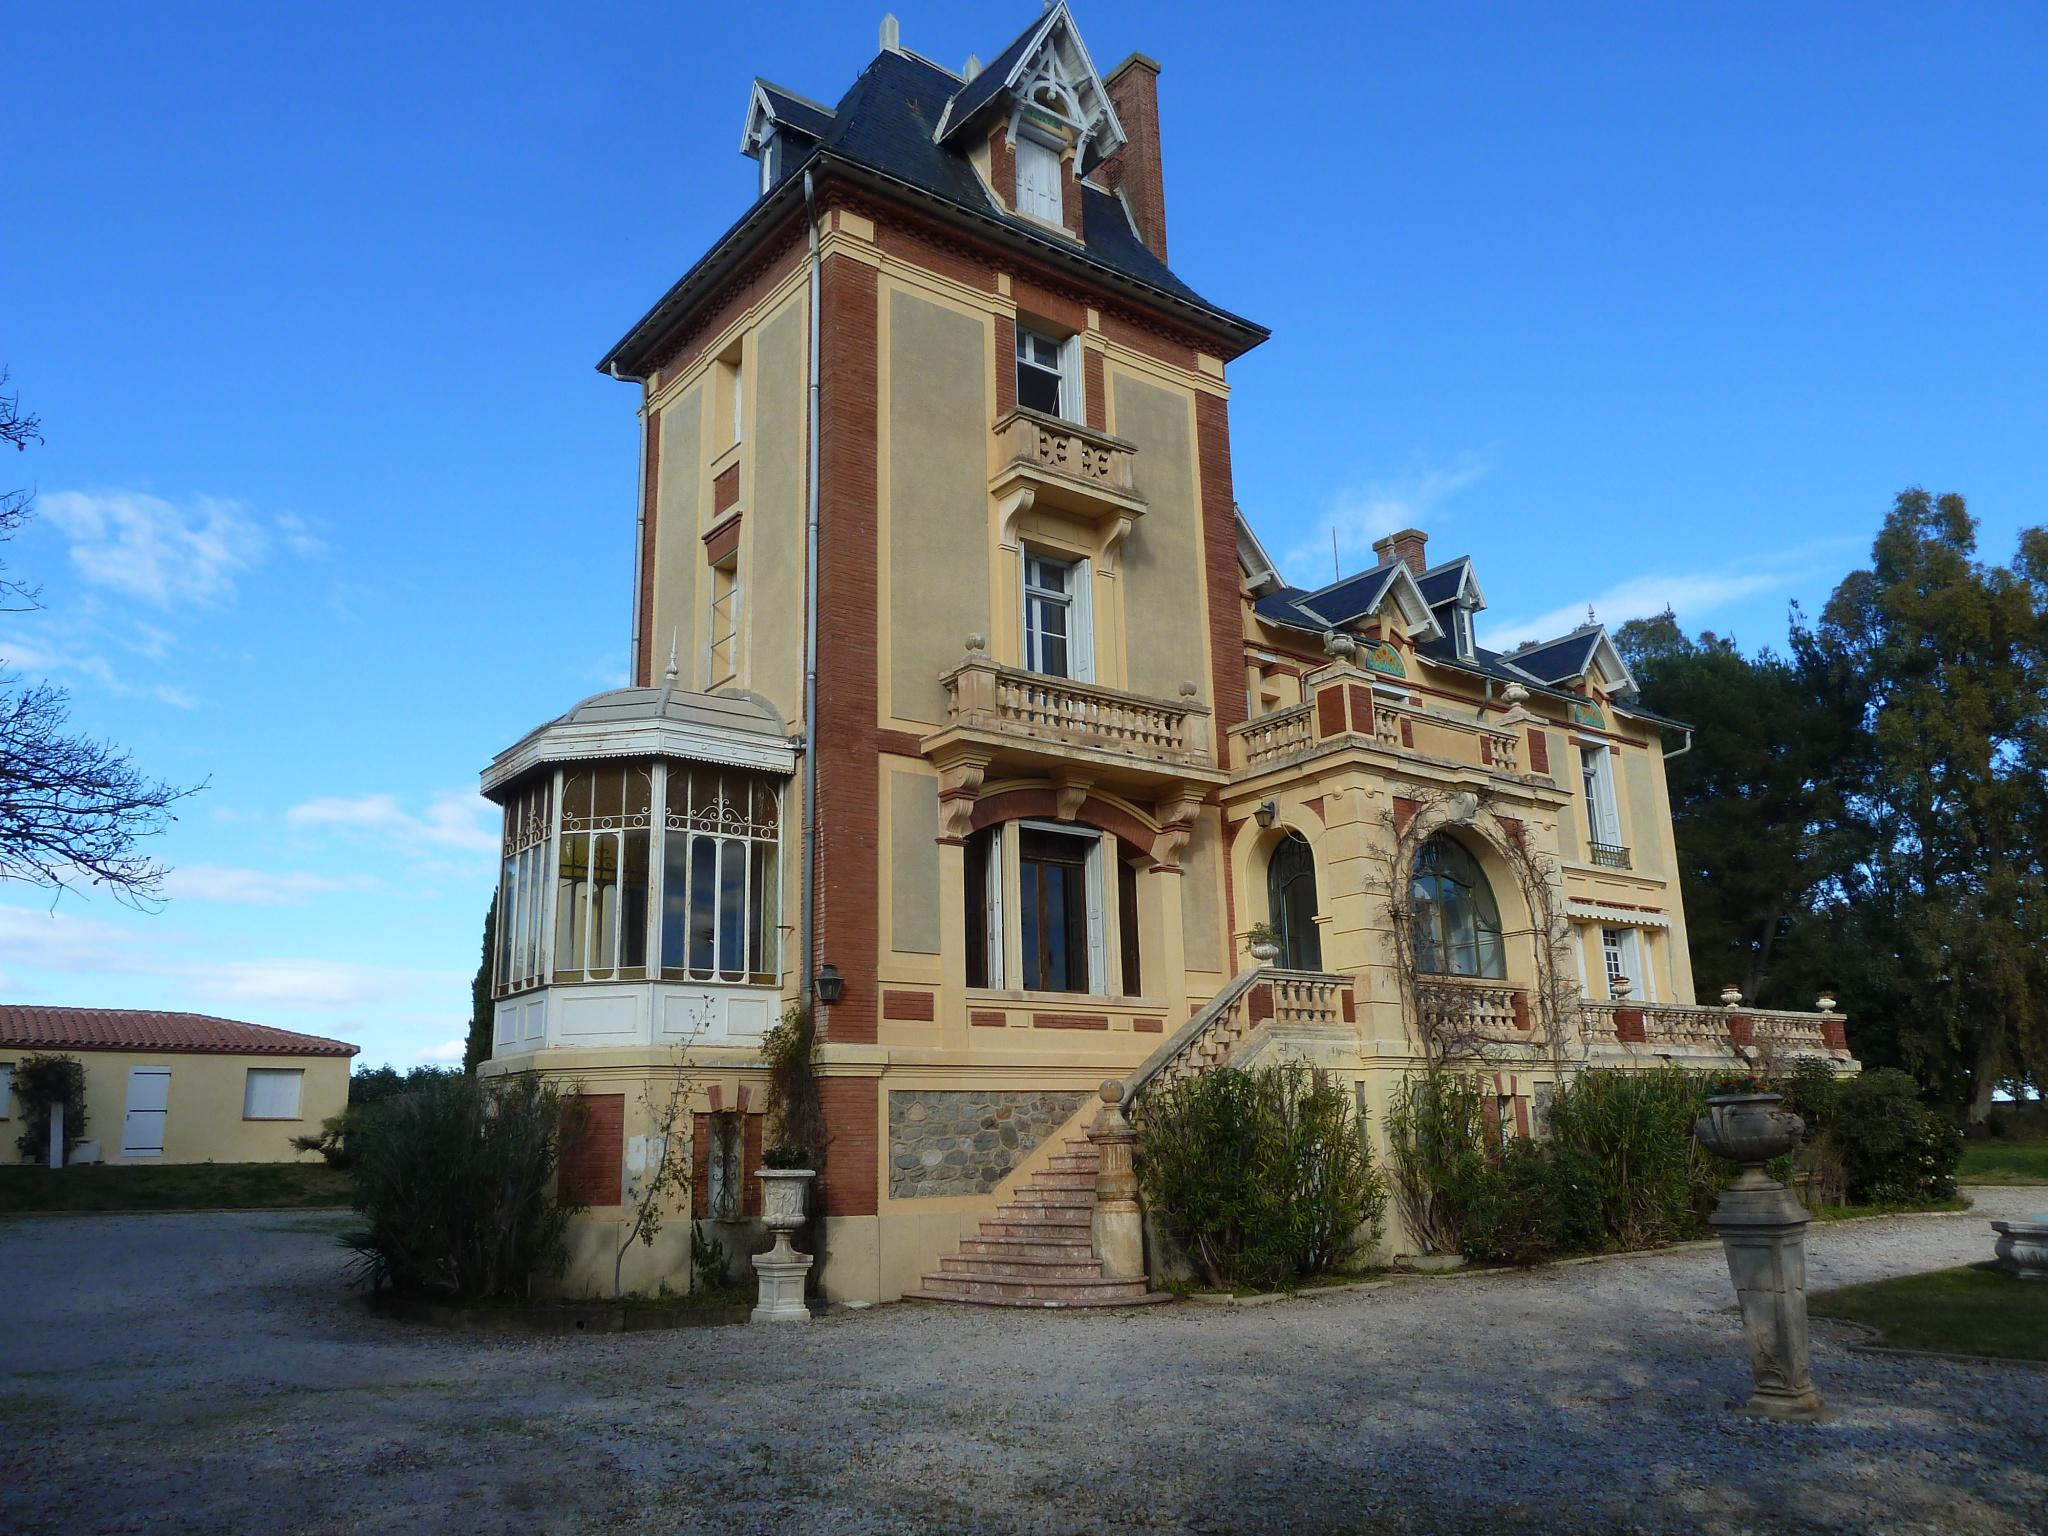 À vendre chateau de 760m2 à brouilla (66620) - Photo 5'